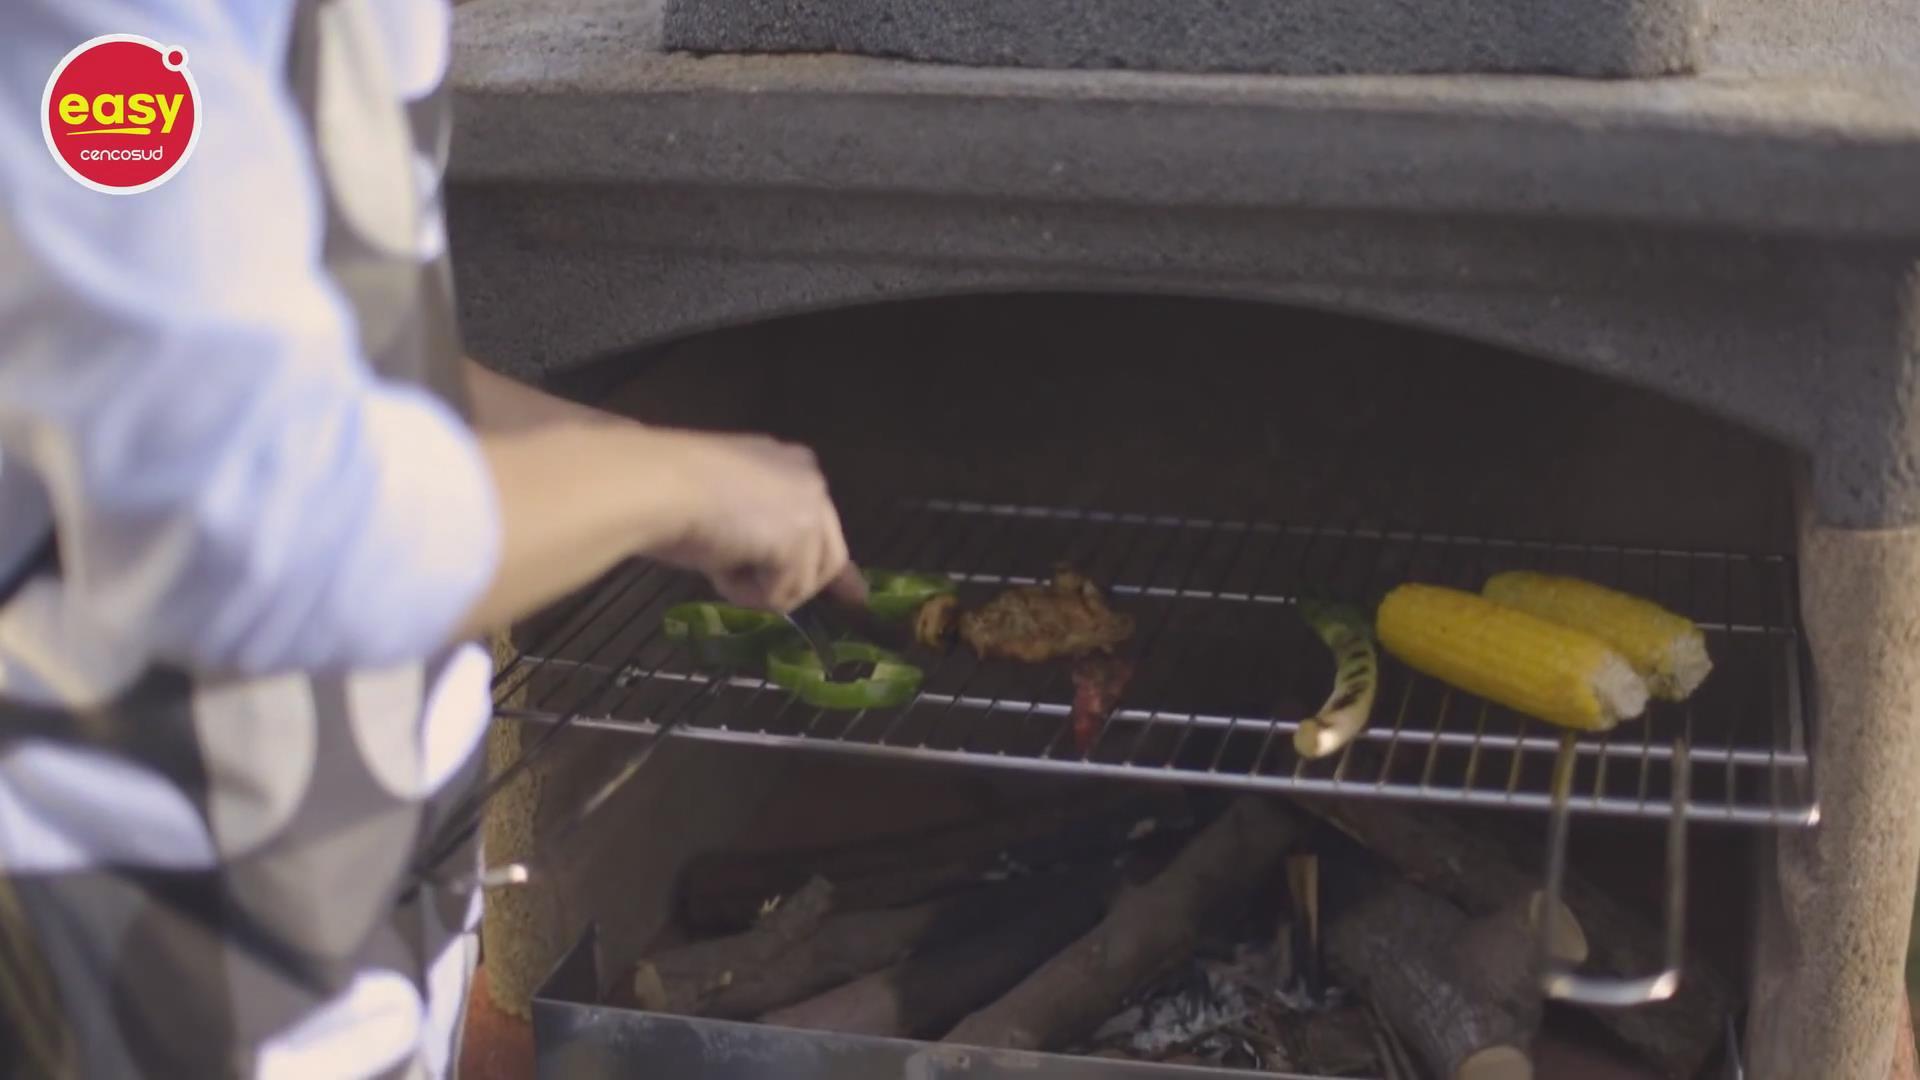 PALAZZETTI品牌燃木壁炉宣传视频